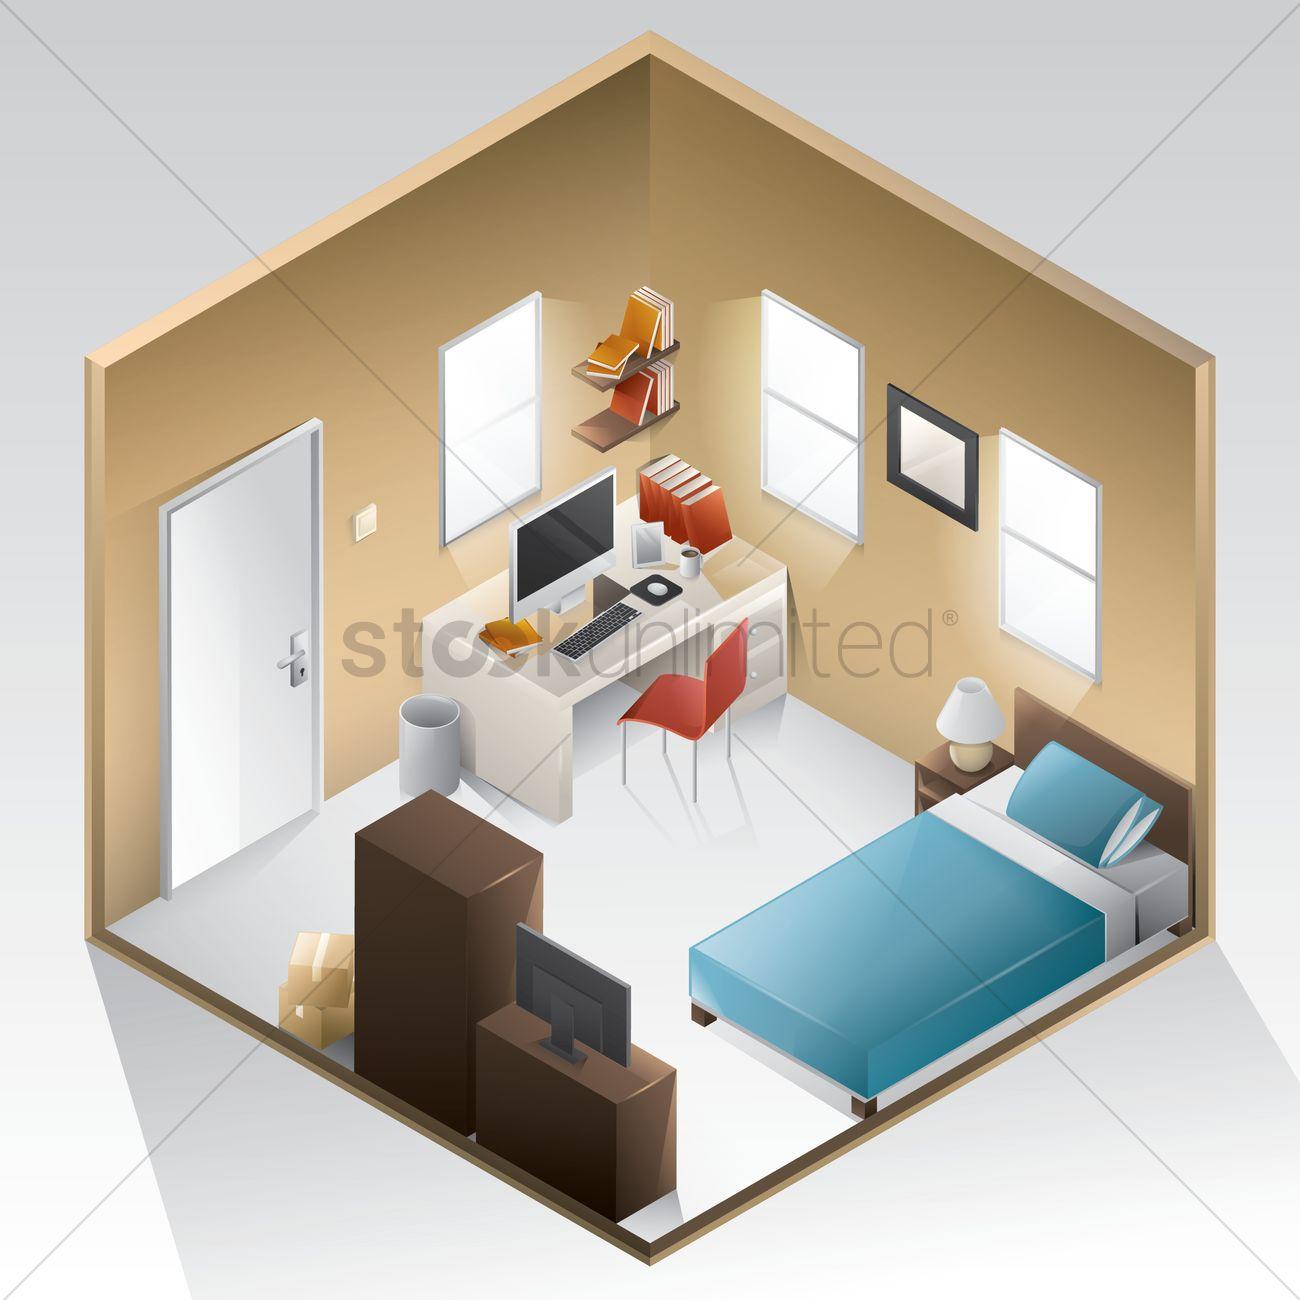 Bedroom Vector Image 1619464 Stockunlimited